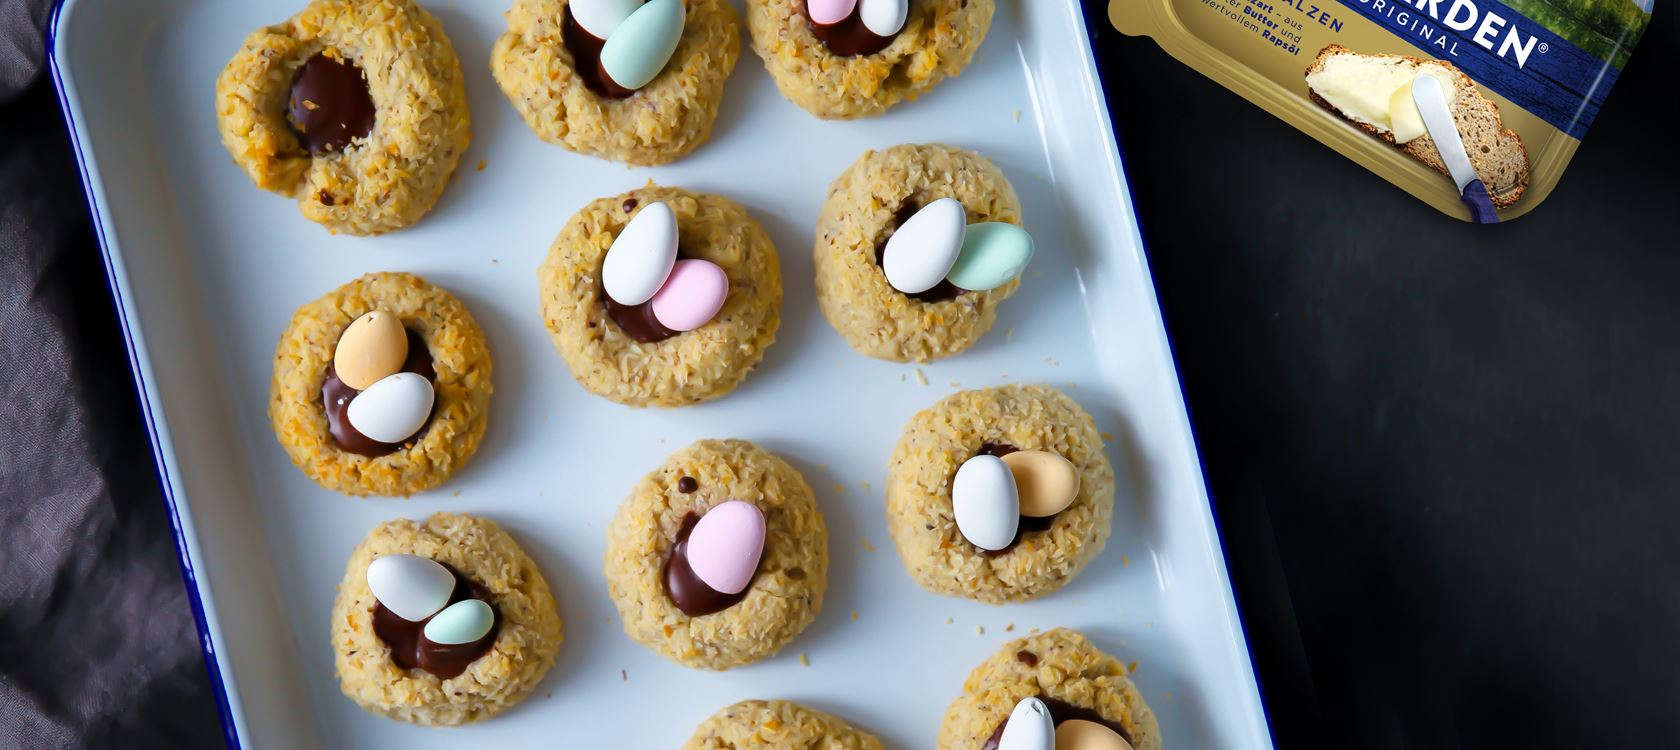 Haselnuss-Kokos-Oster-Cookies mit Schokoladenfüllung